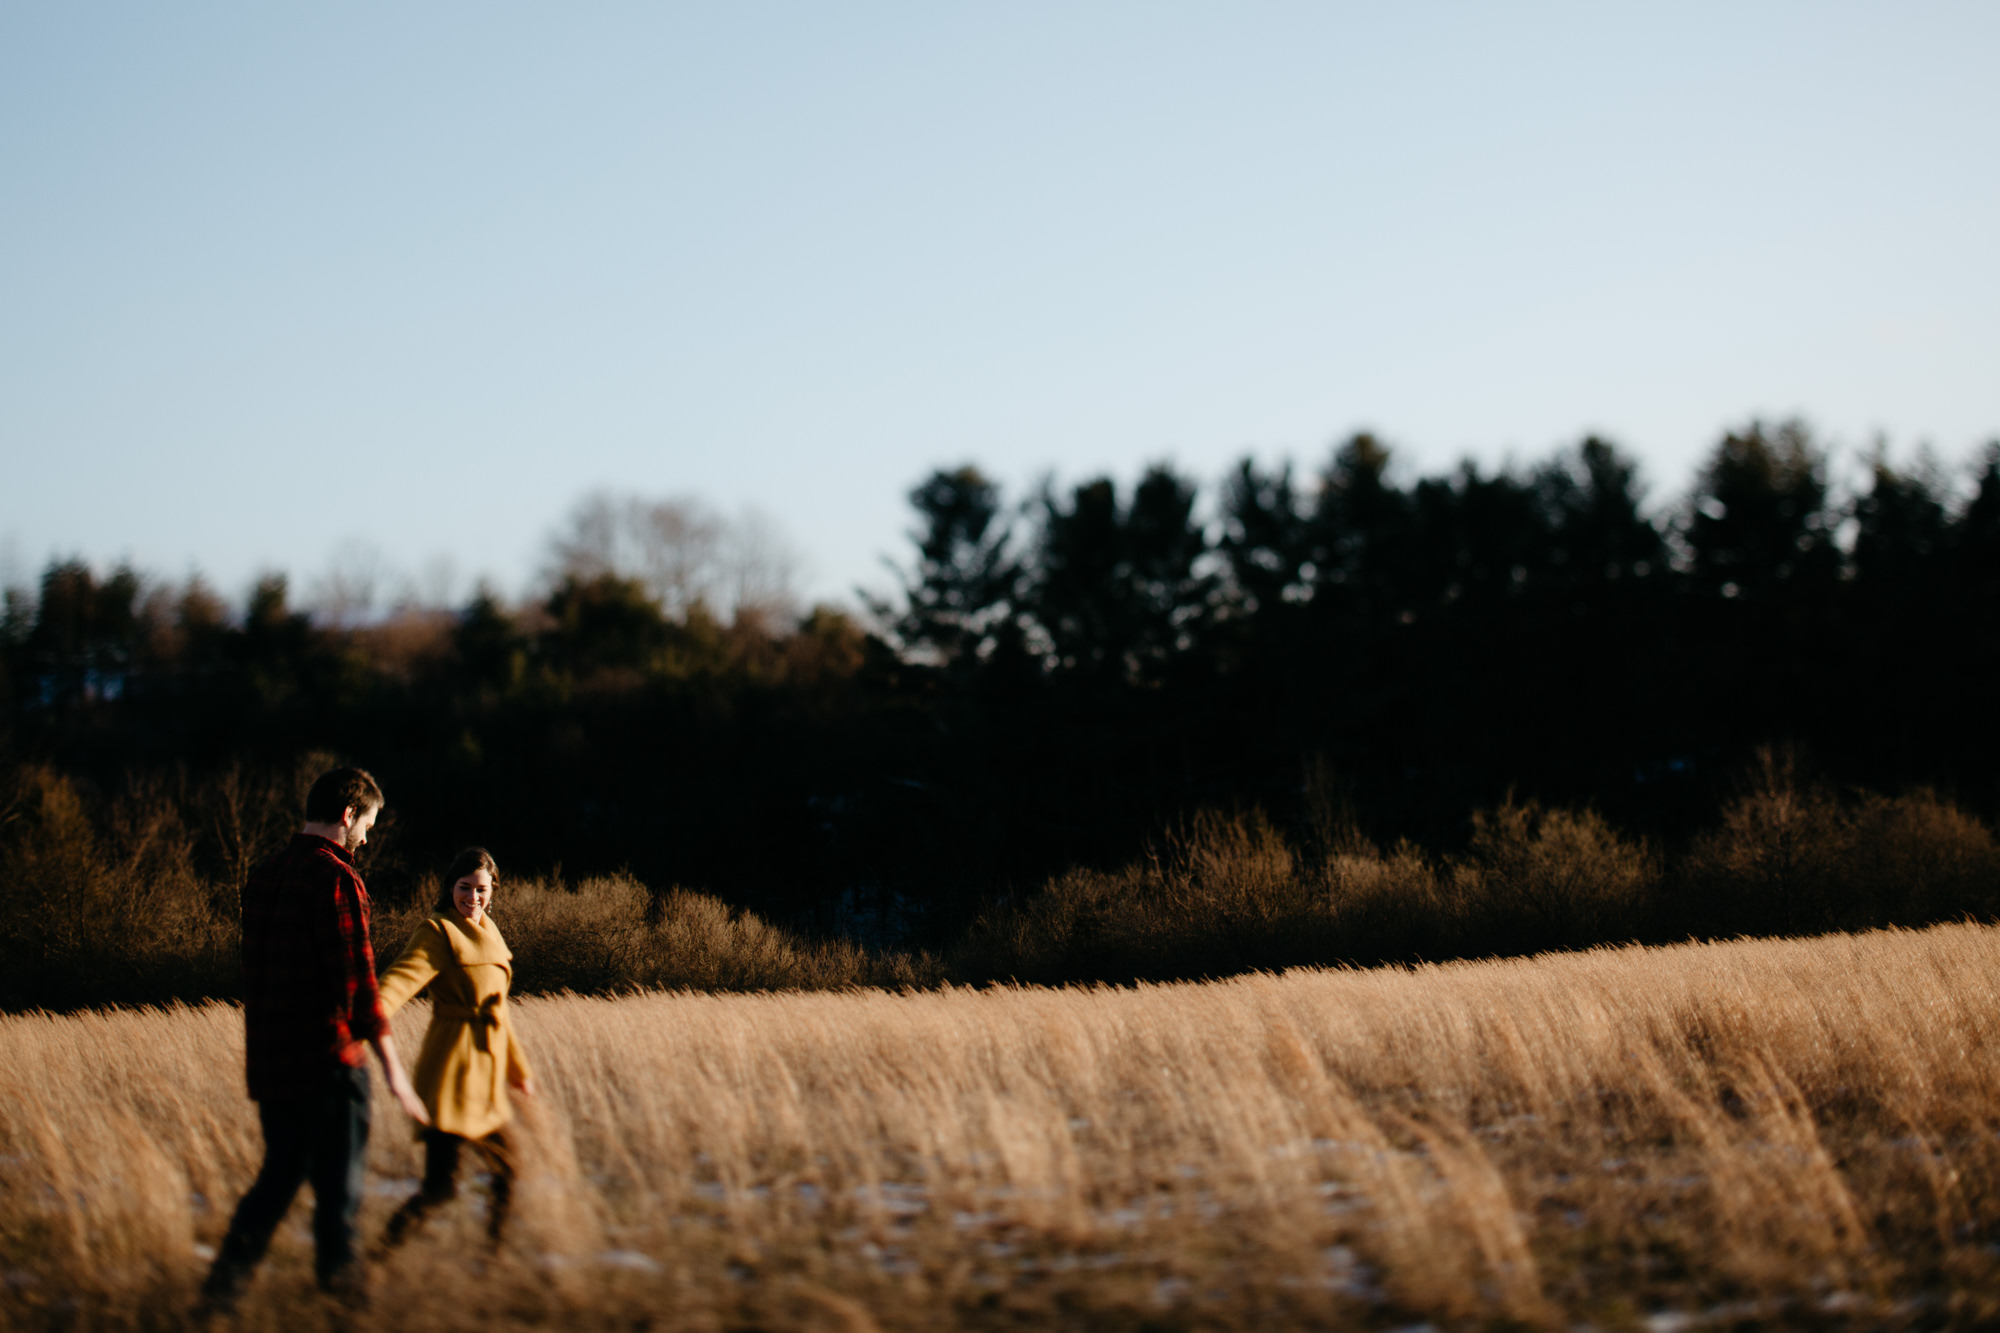 Heritage-Park-Engagement-Blacksburg-Wedding-Photographer-12.jpg